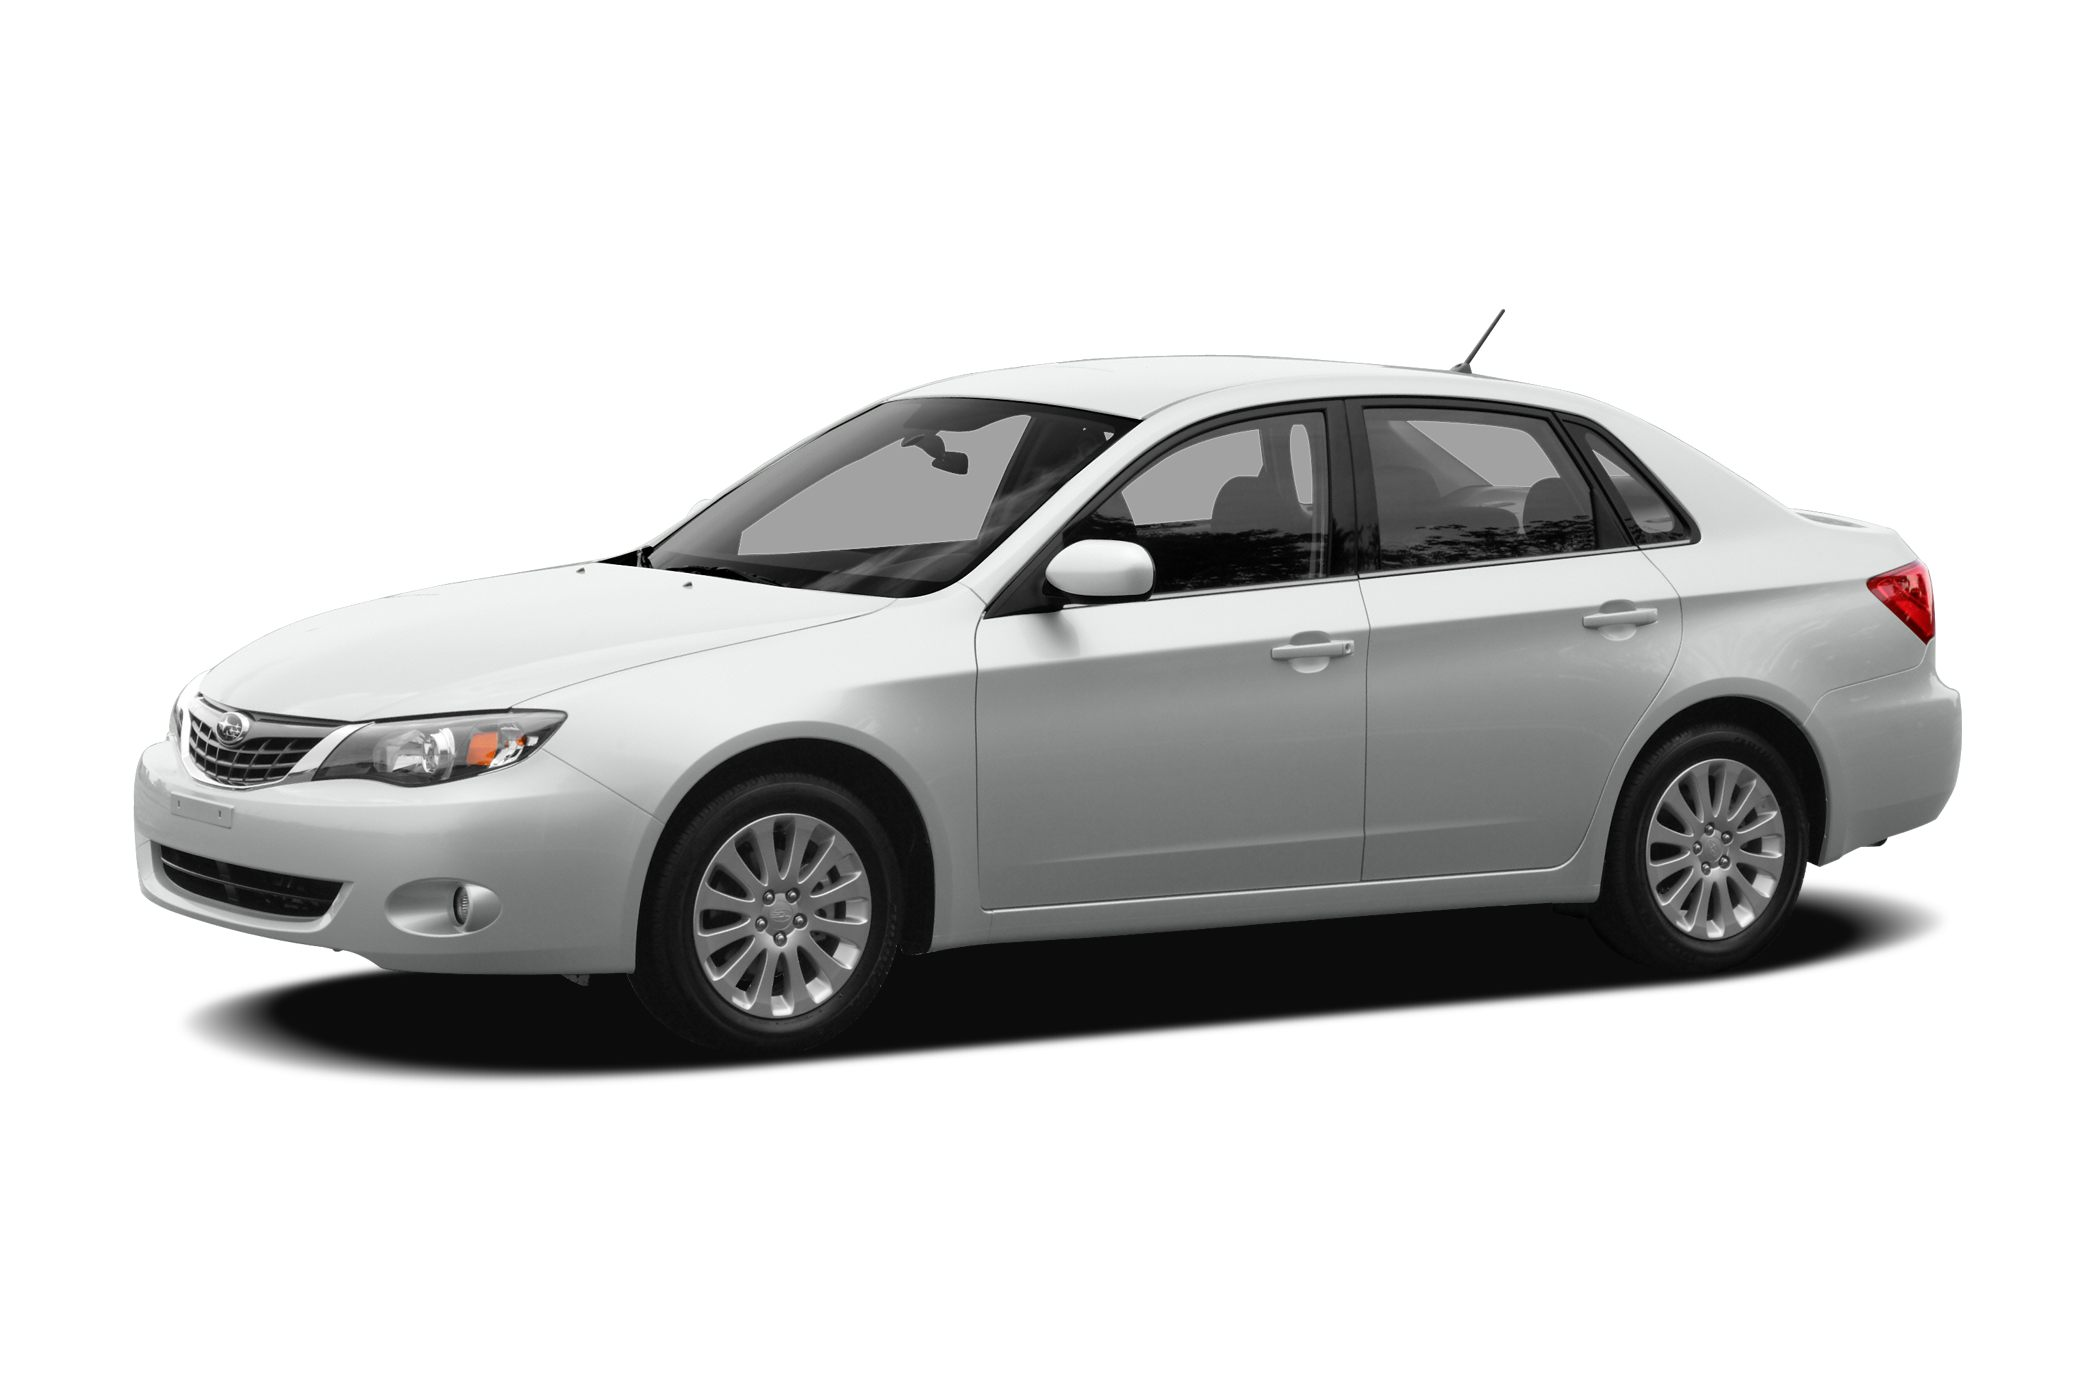 2009 Subaru Impreza 2.5 I Sedan for sale in Rochester for $10,495 with 99,058 miles